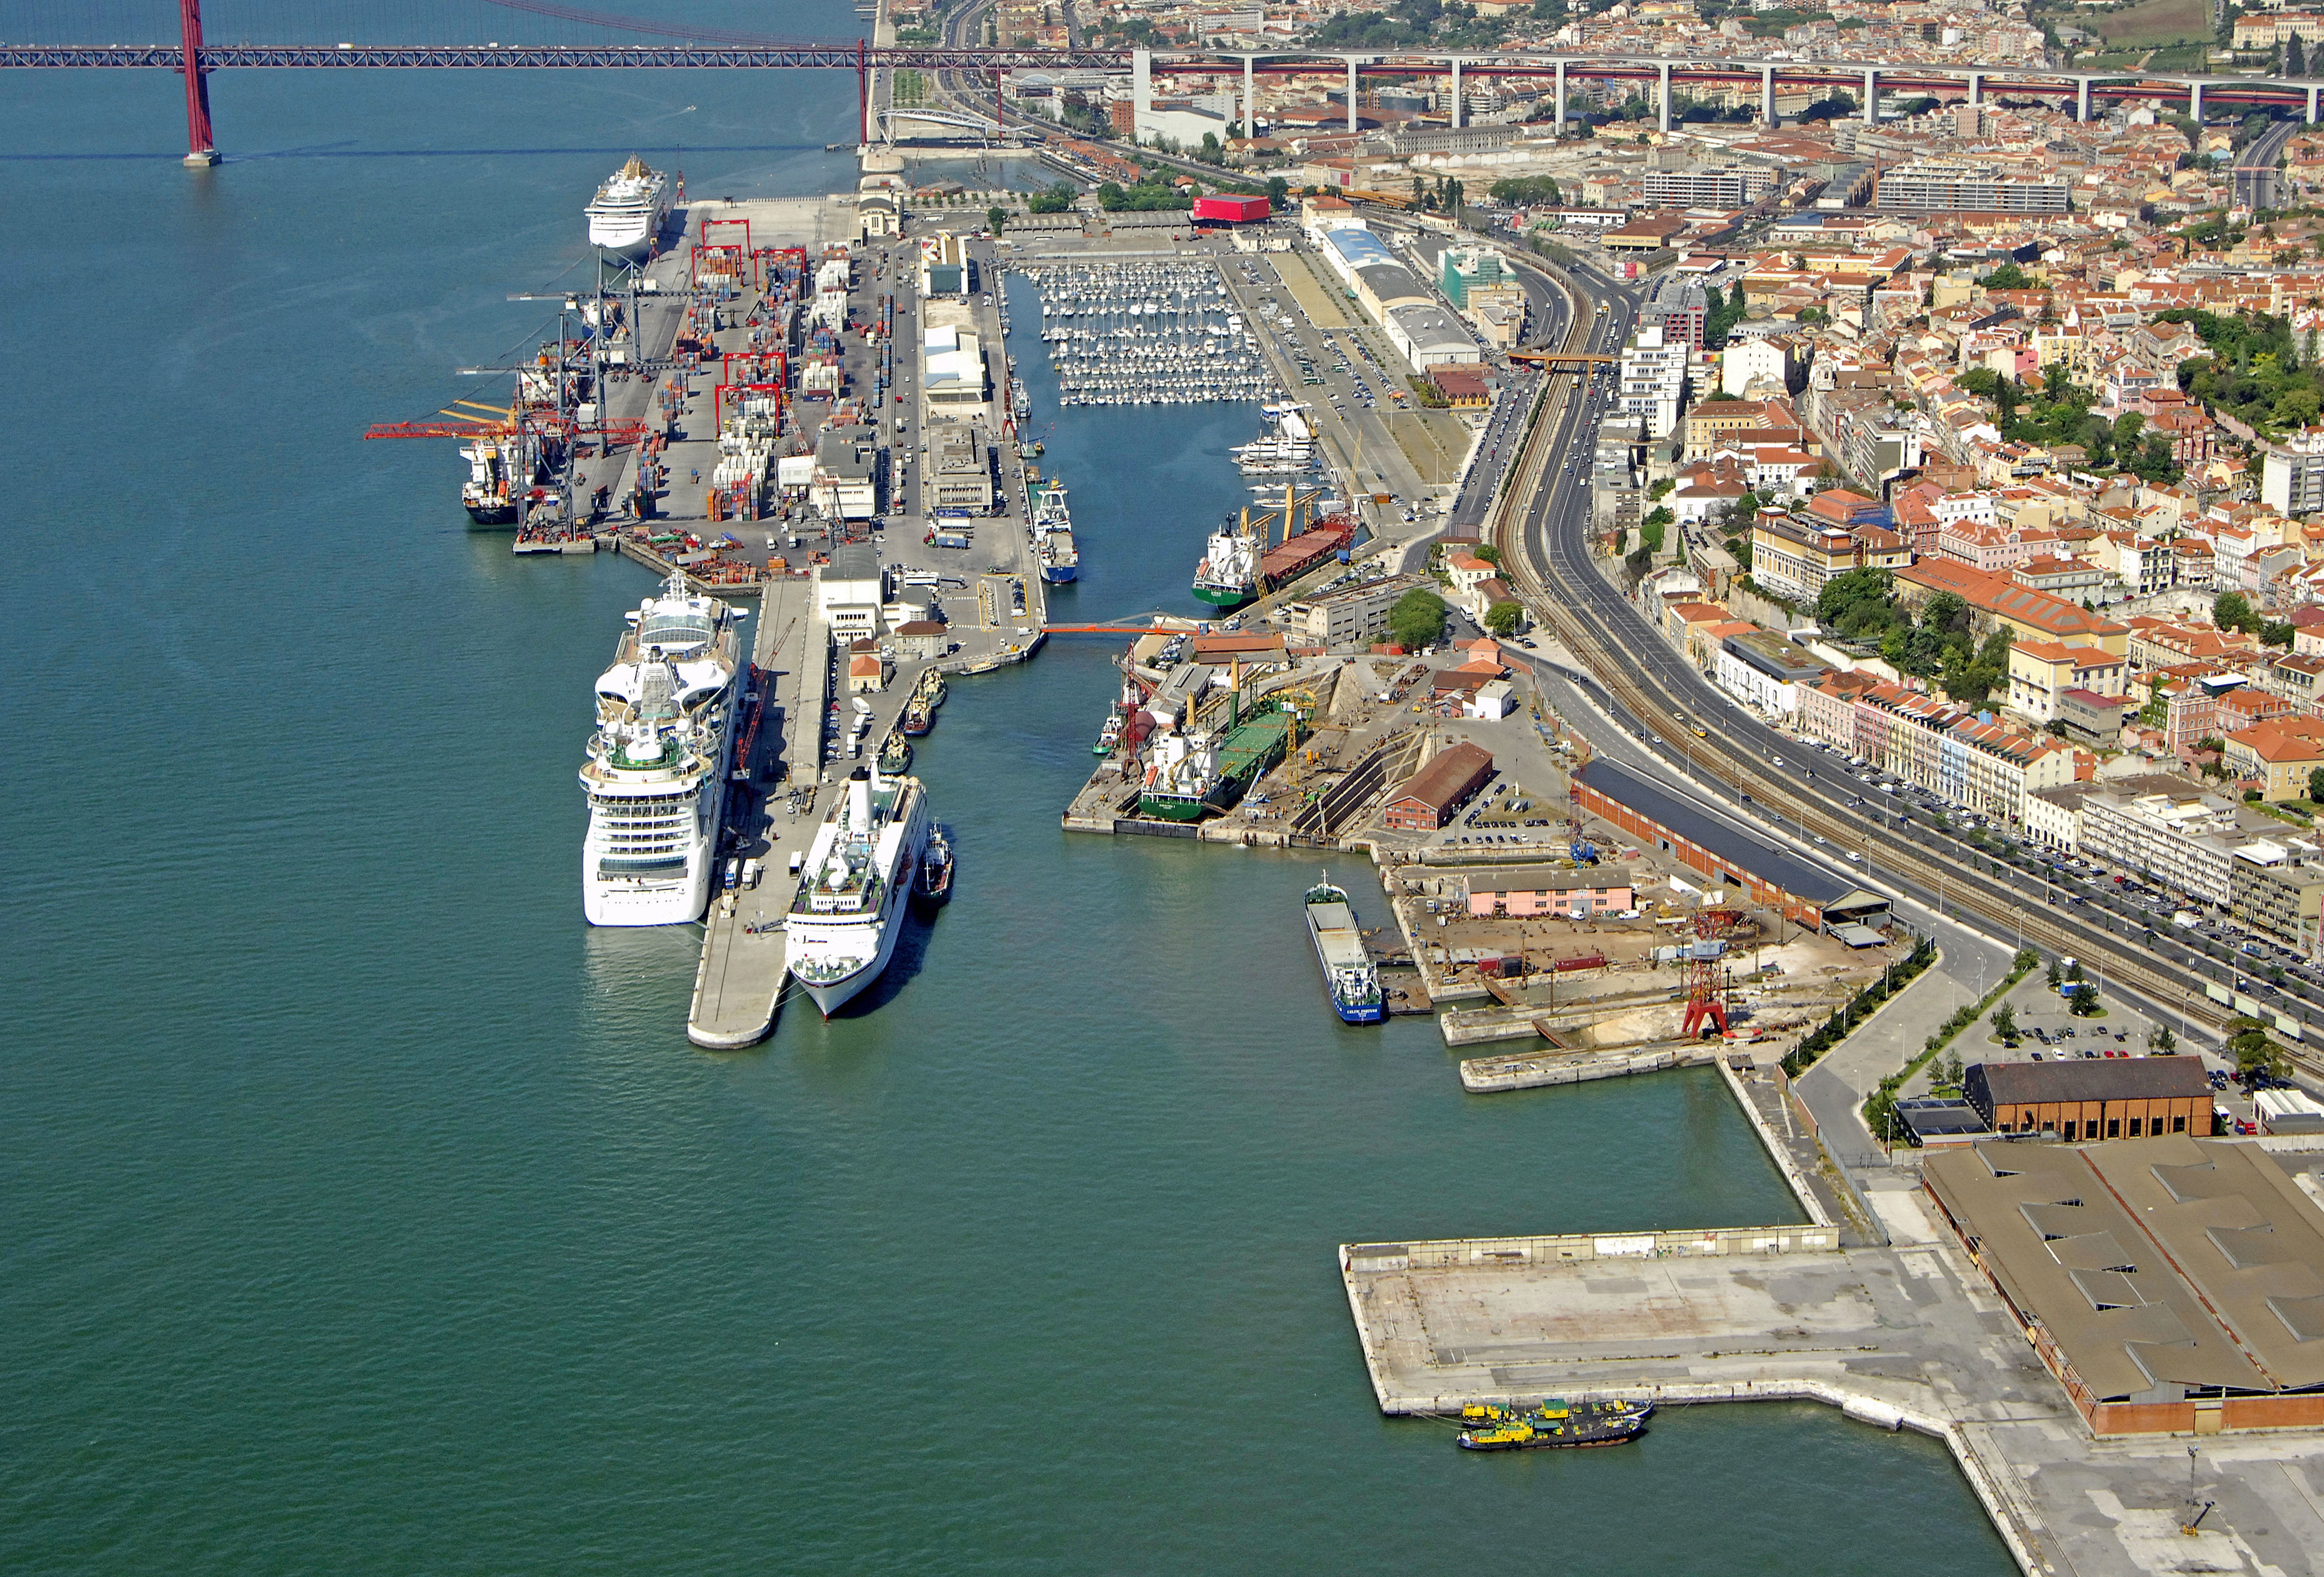 Doca De Alcantara Marina in Alcantara, Lisboa, Portugal